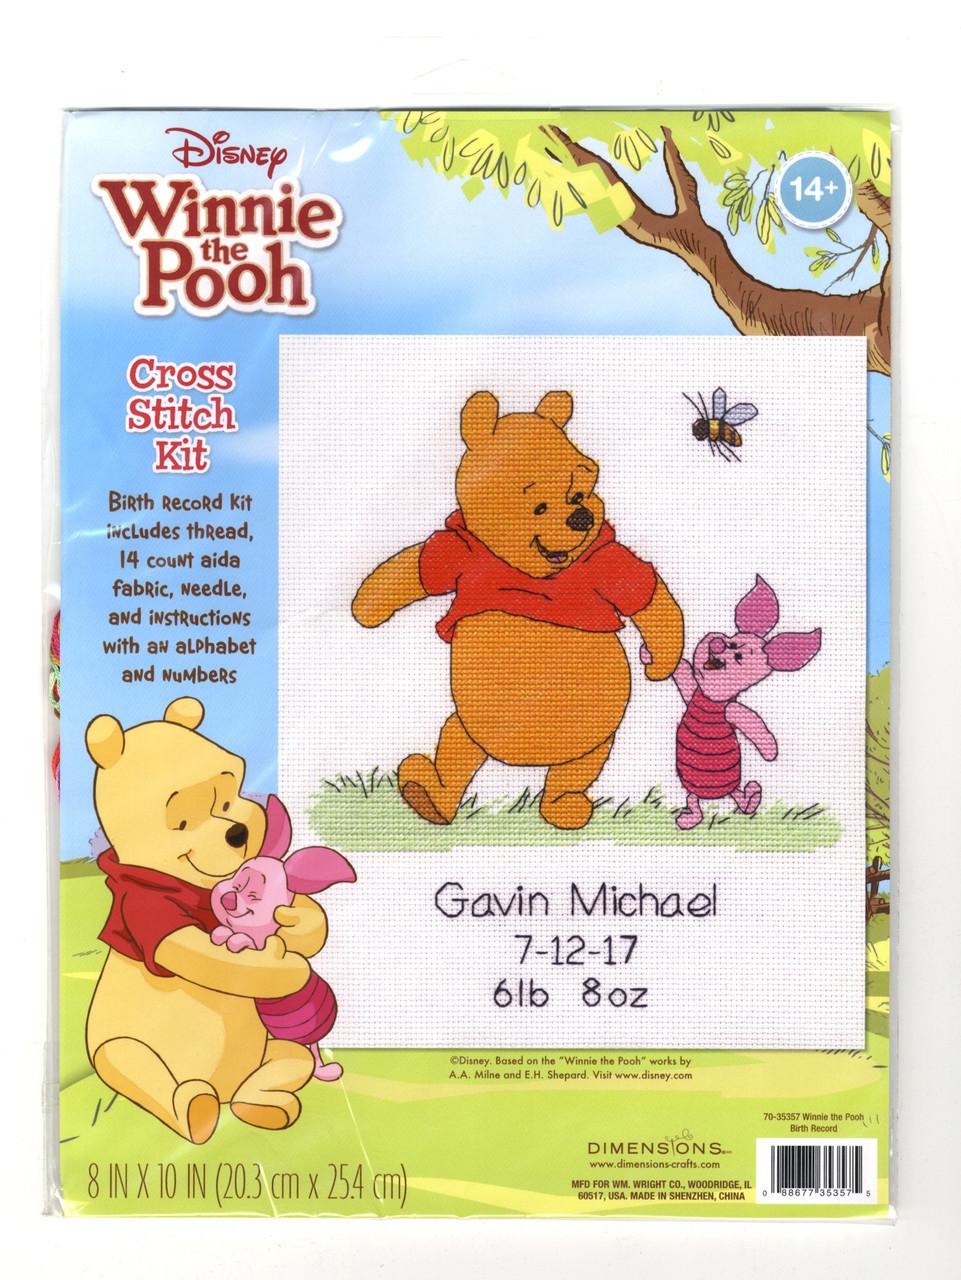 Dimensions - Disney Winnie the Pooh Birth Record